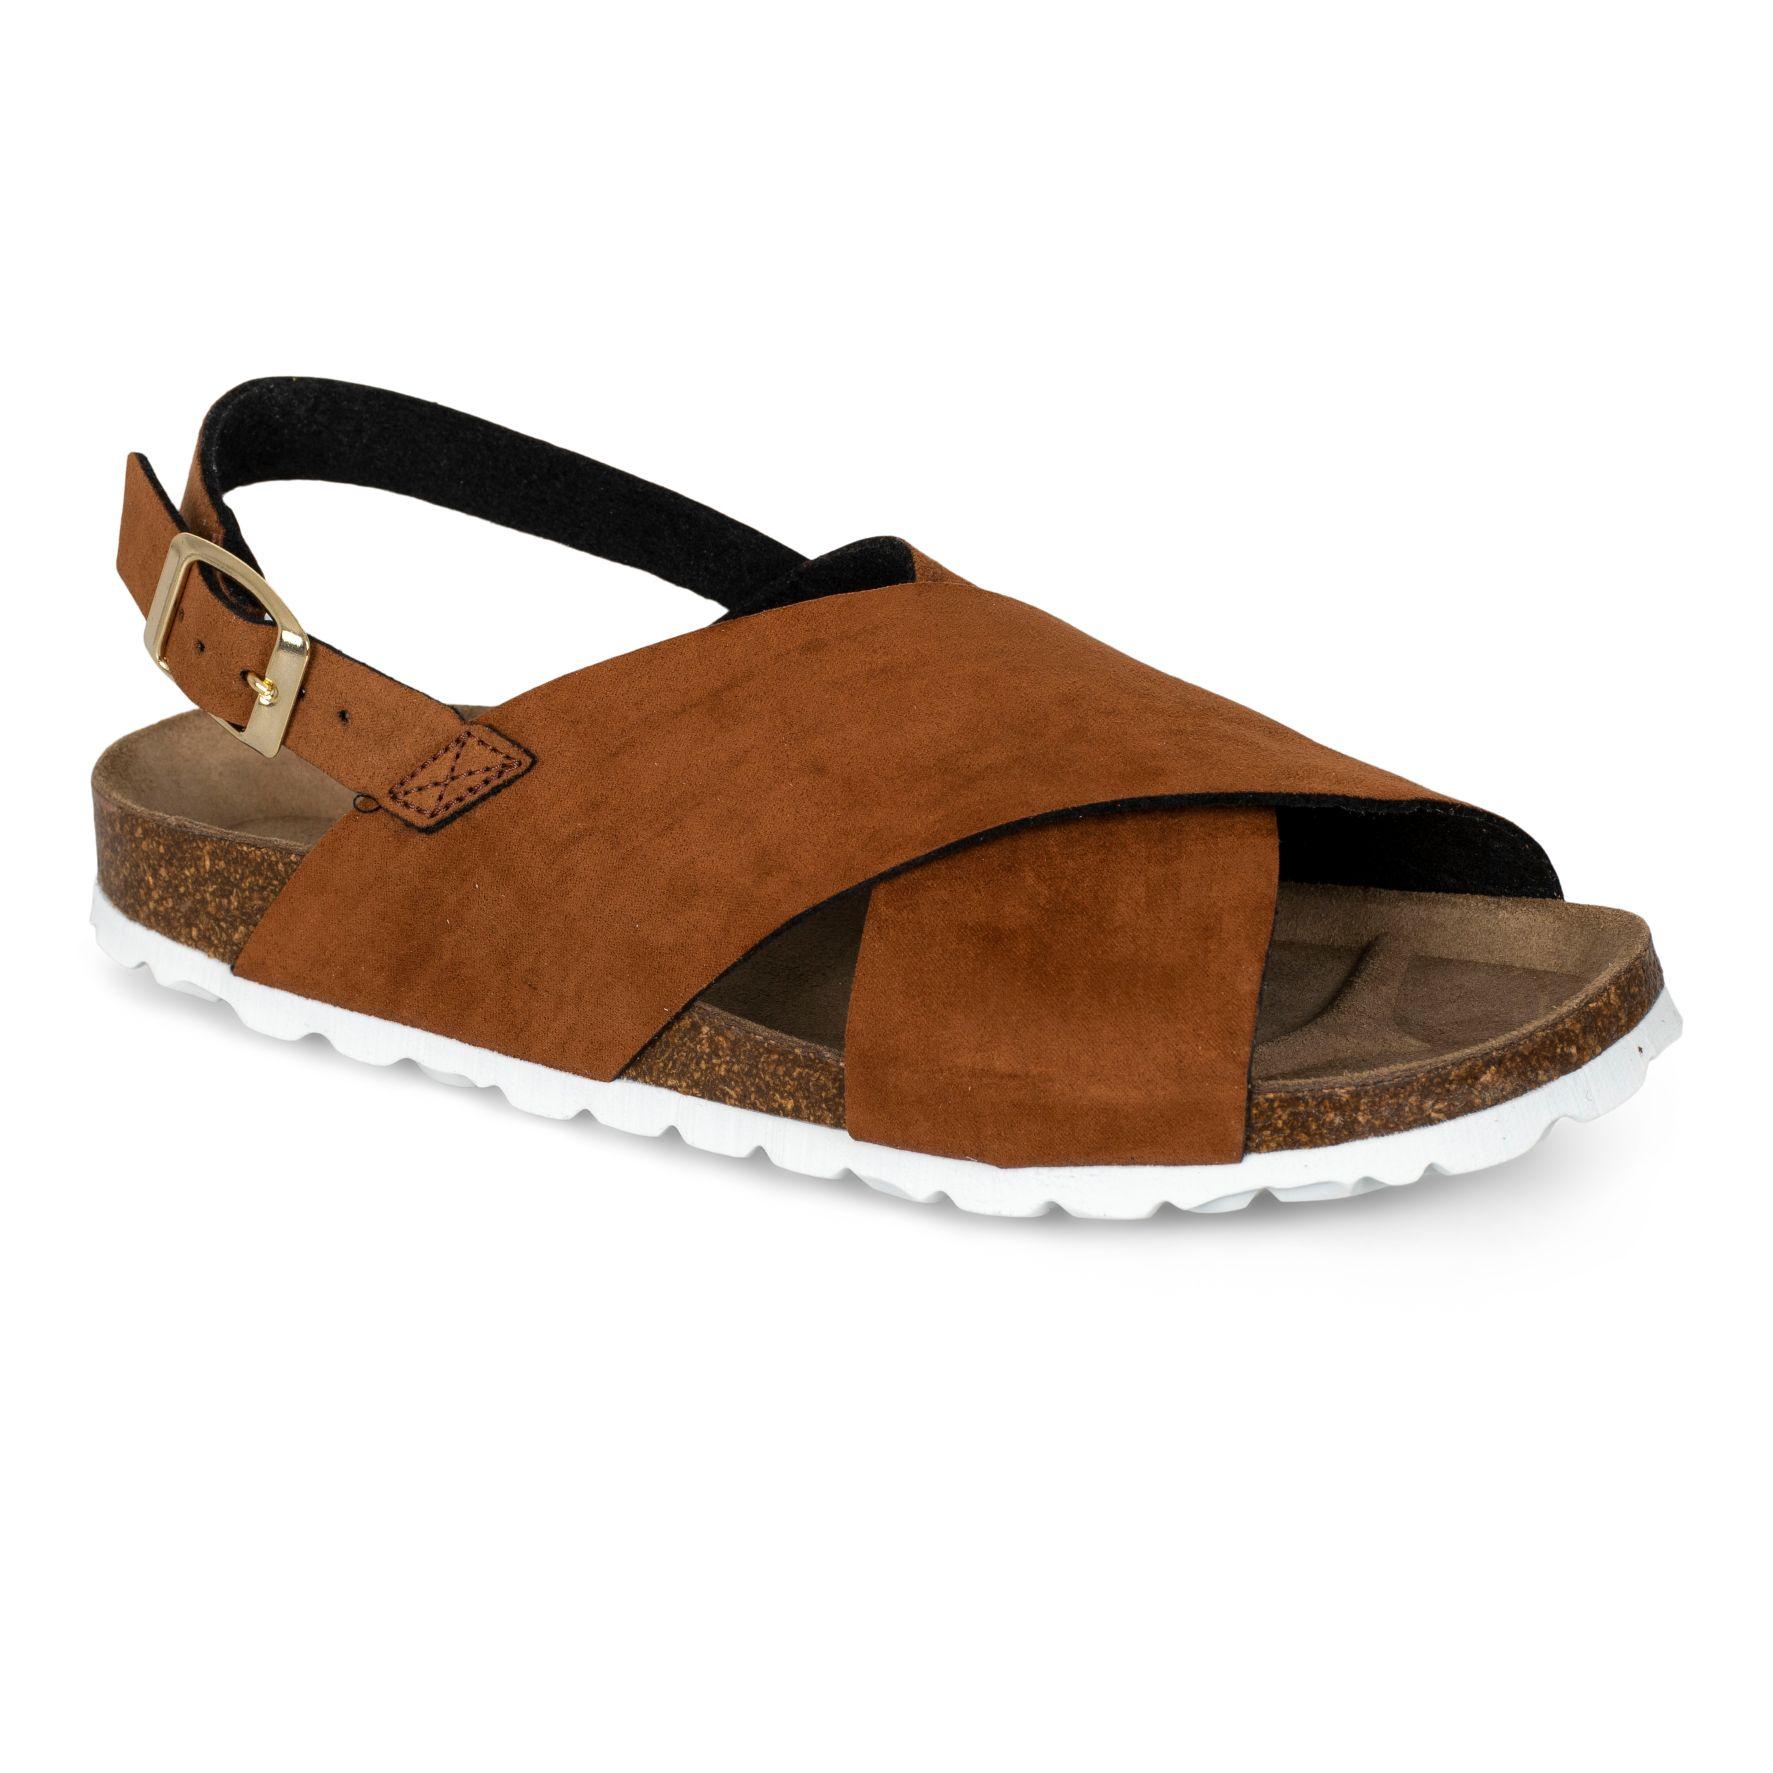 Nordstrand 11978 sandal